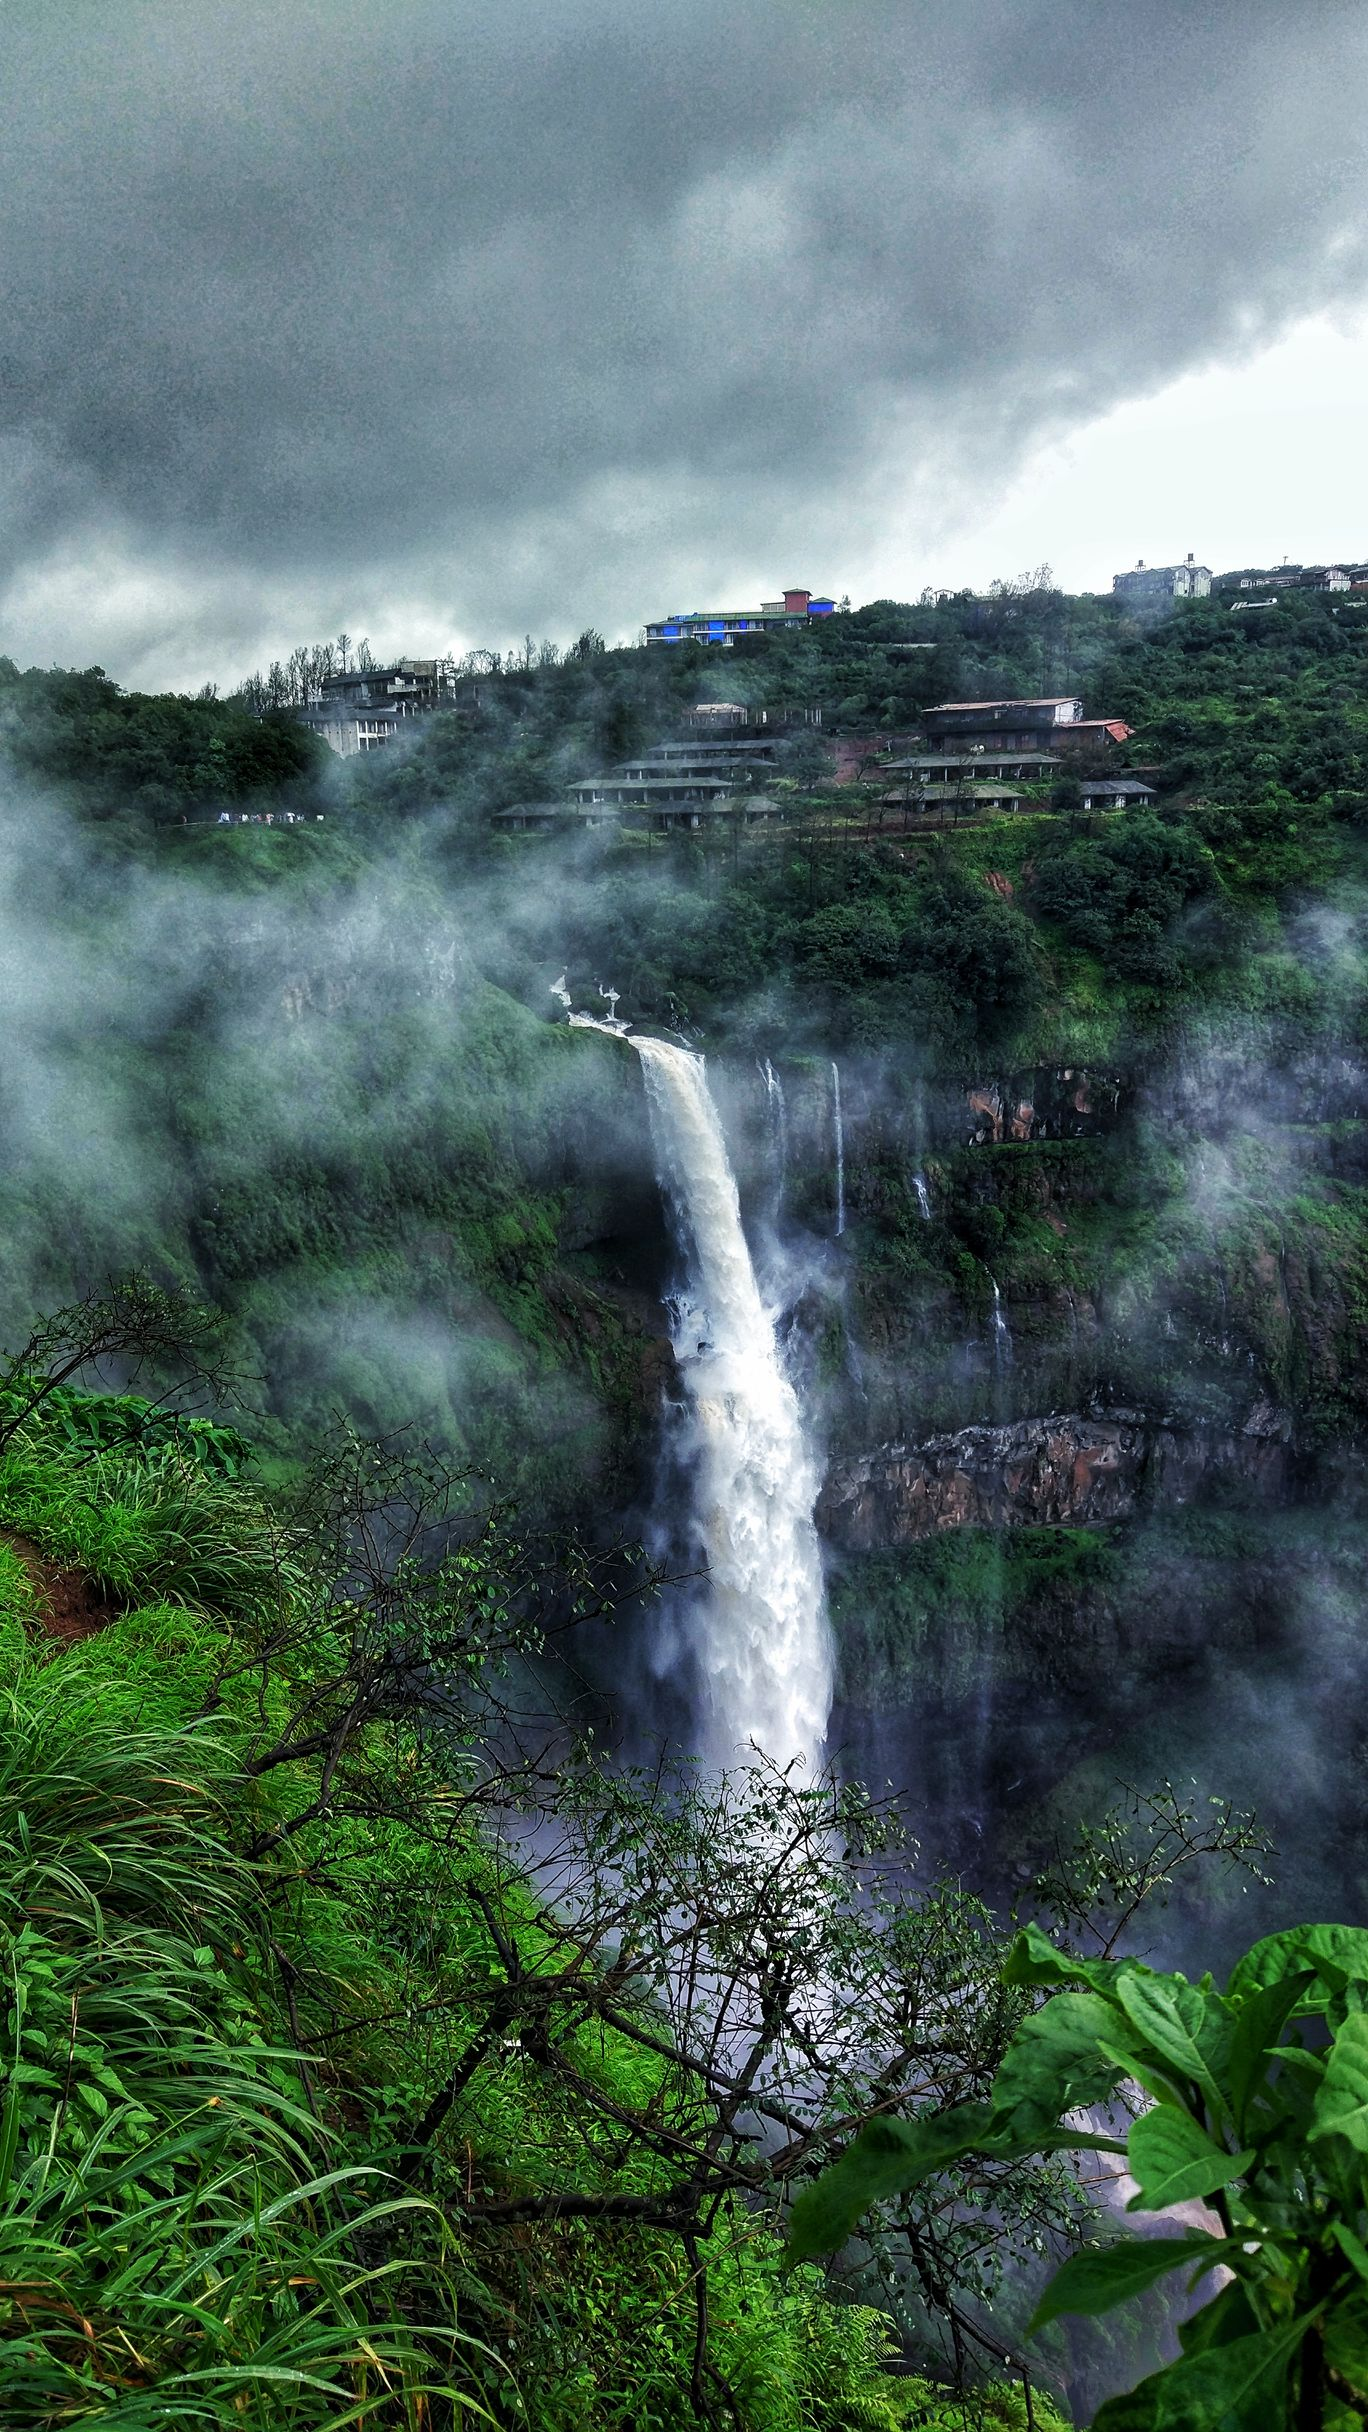 Photo of Lingmala Waterfall By Vineet Tomar